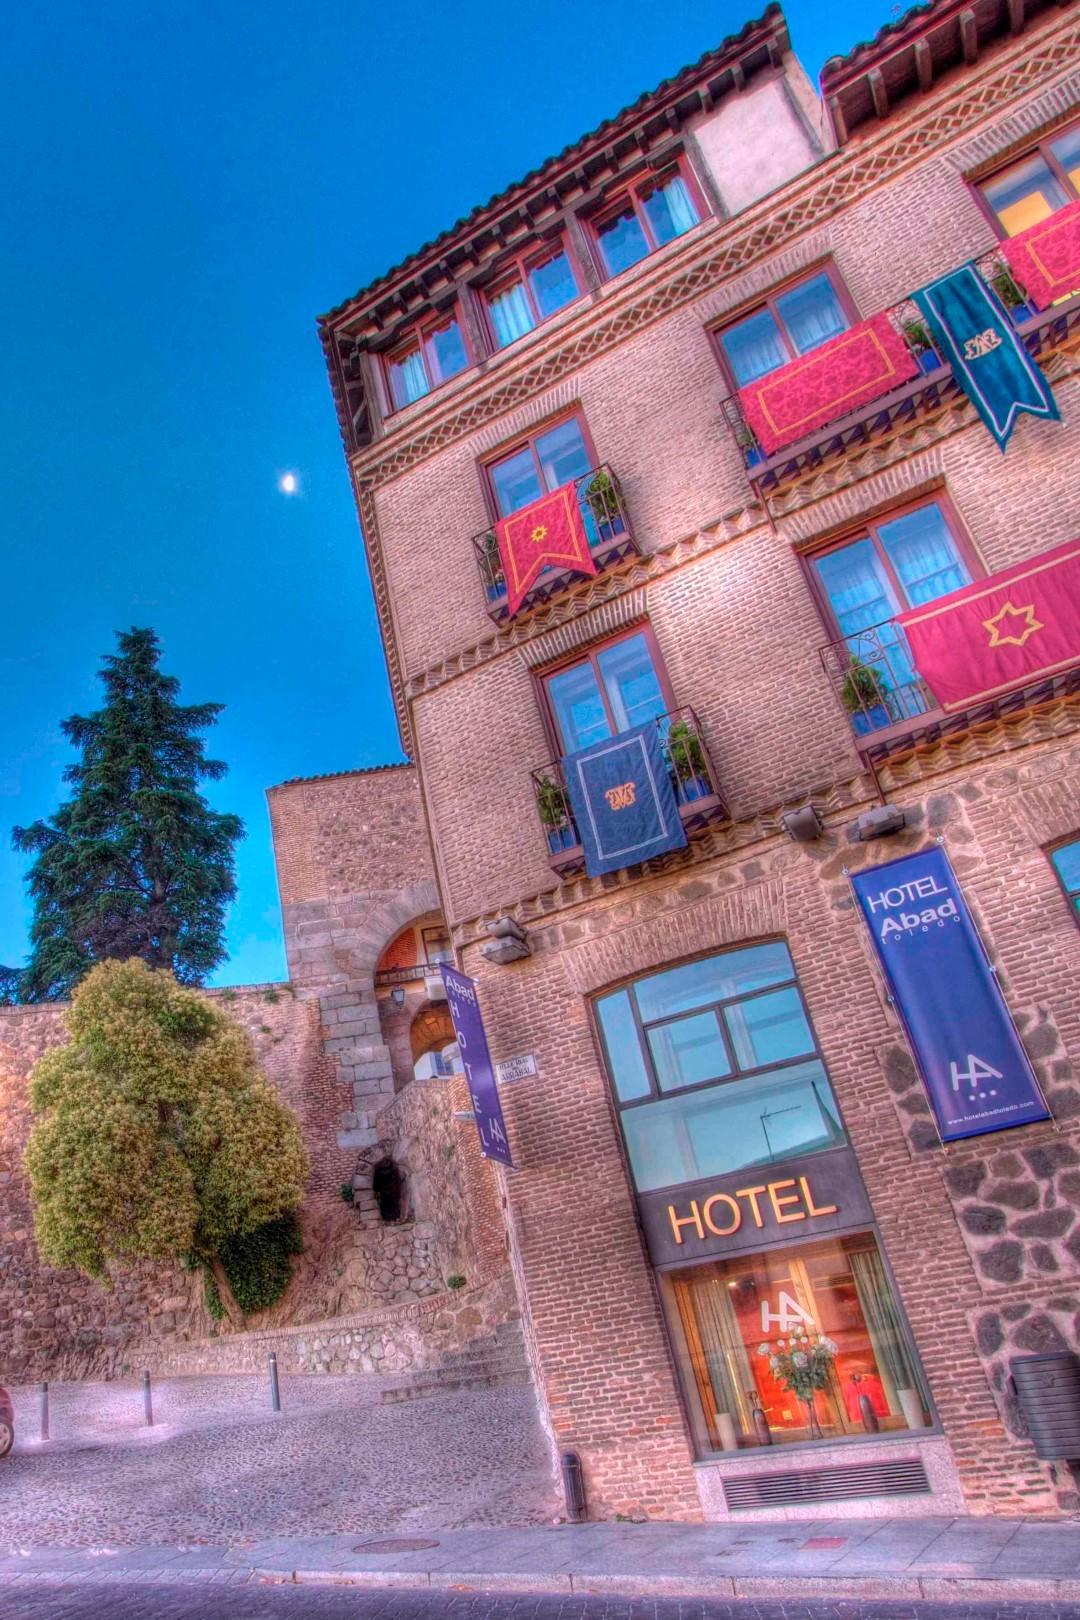 Hotel Abad, Toledo, Spain, Travelers Roundtable, Robert Bundy